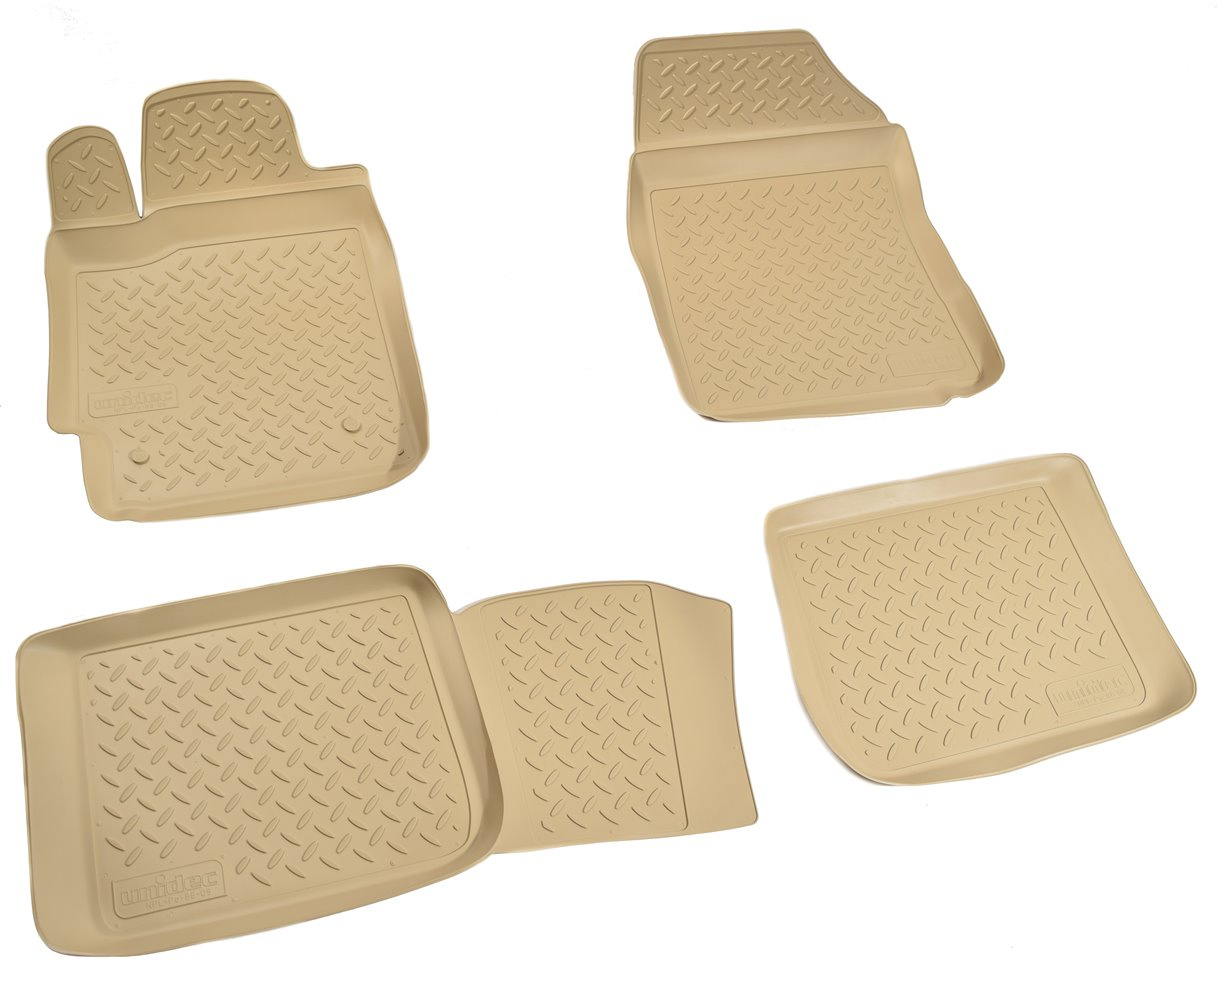 Коврики салона Norplast для Toyota Camry V40 2006-2011, NPL-Po-88-09-B, бежевый